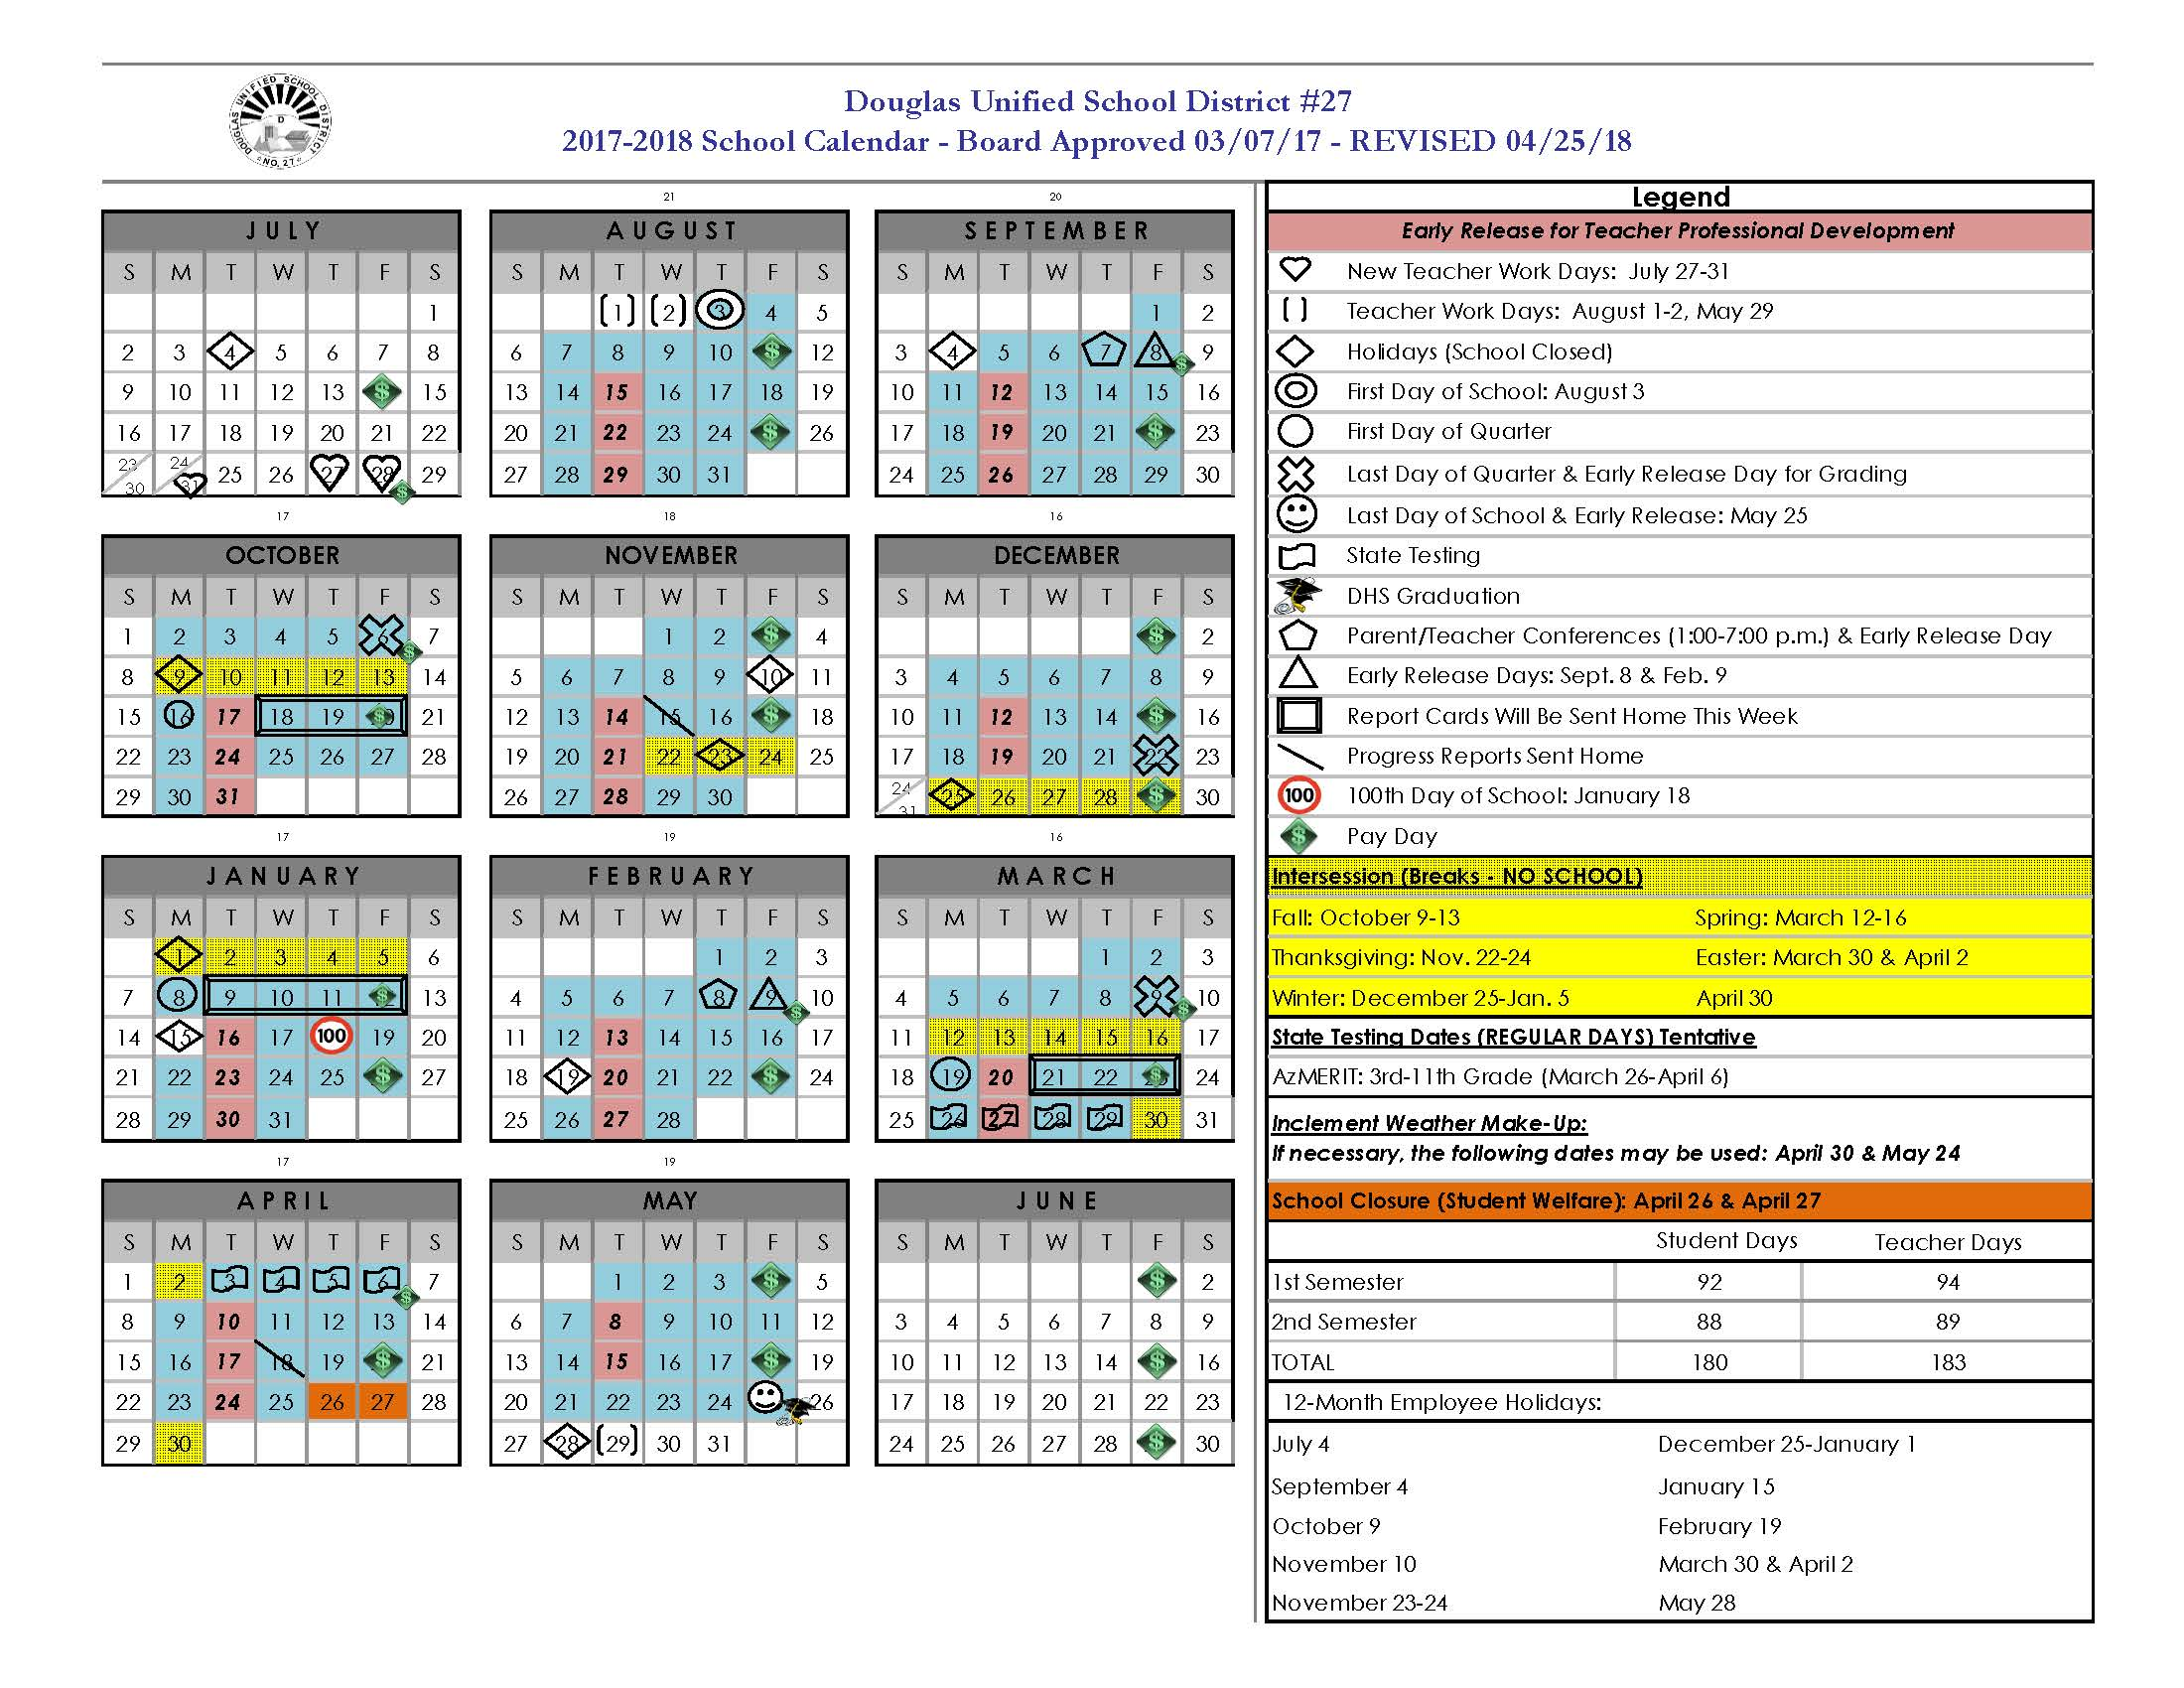 2017-2018 Revised Calendar